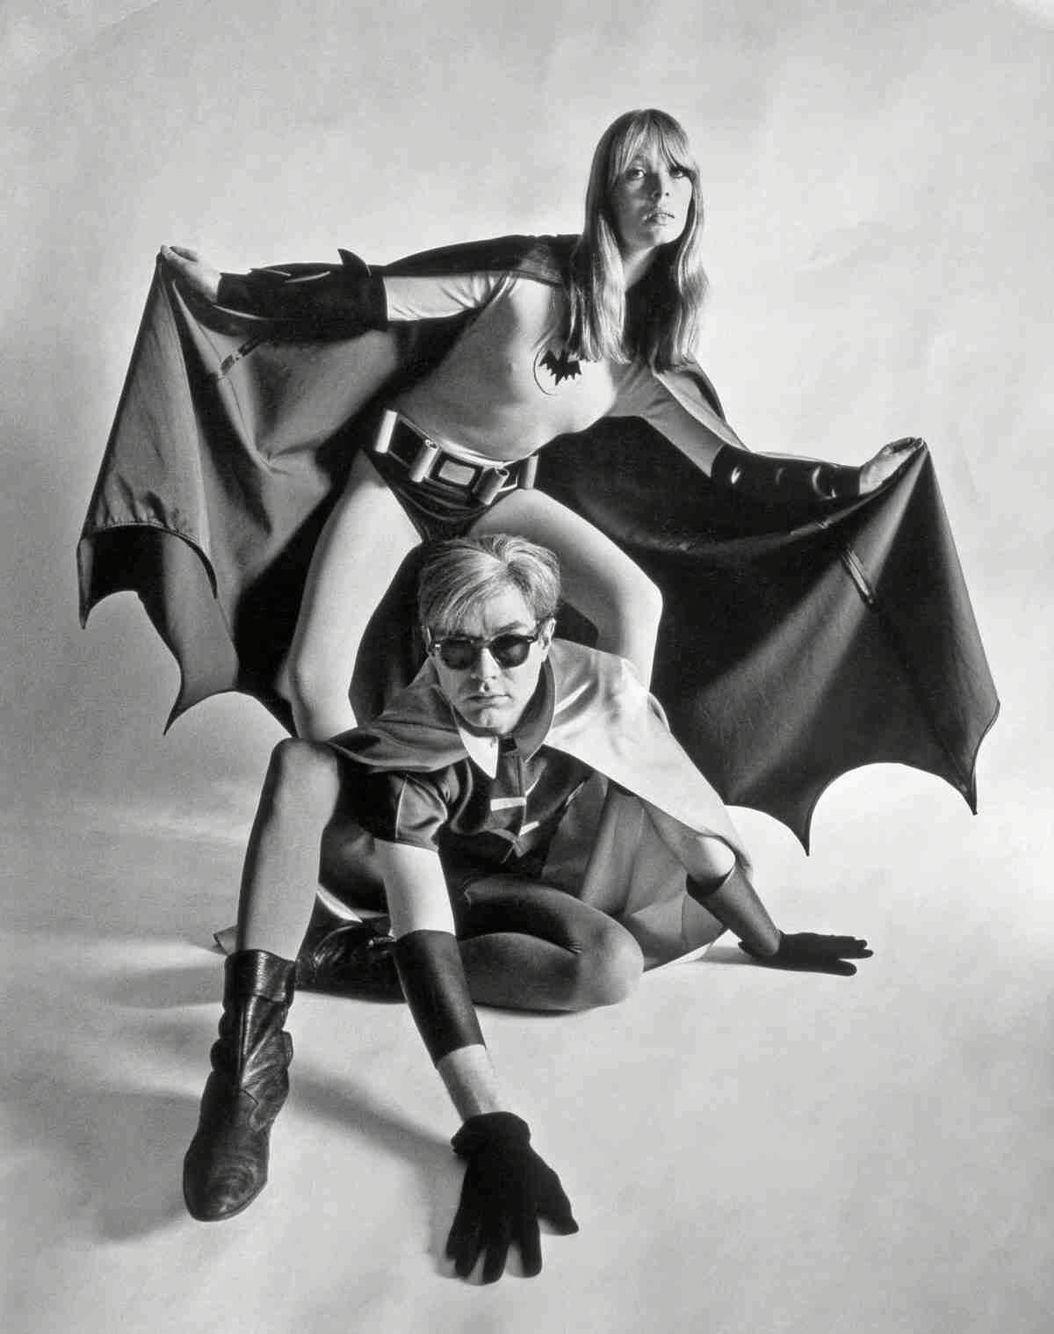 Andy Warhol & Nico 1967